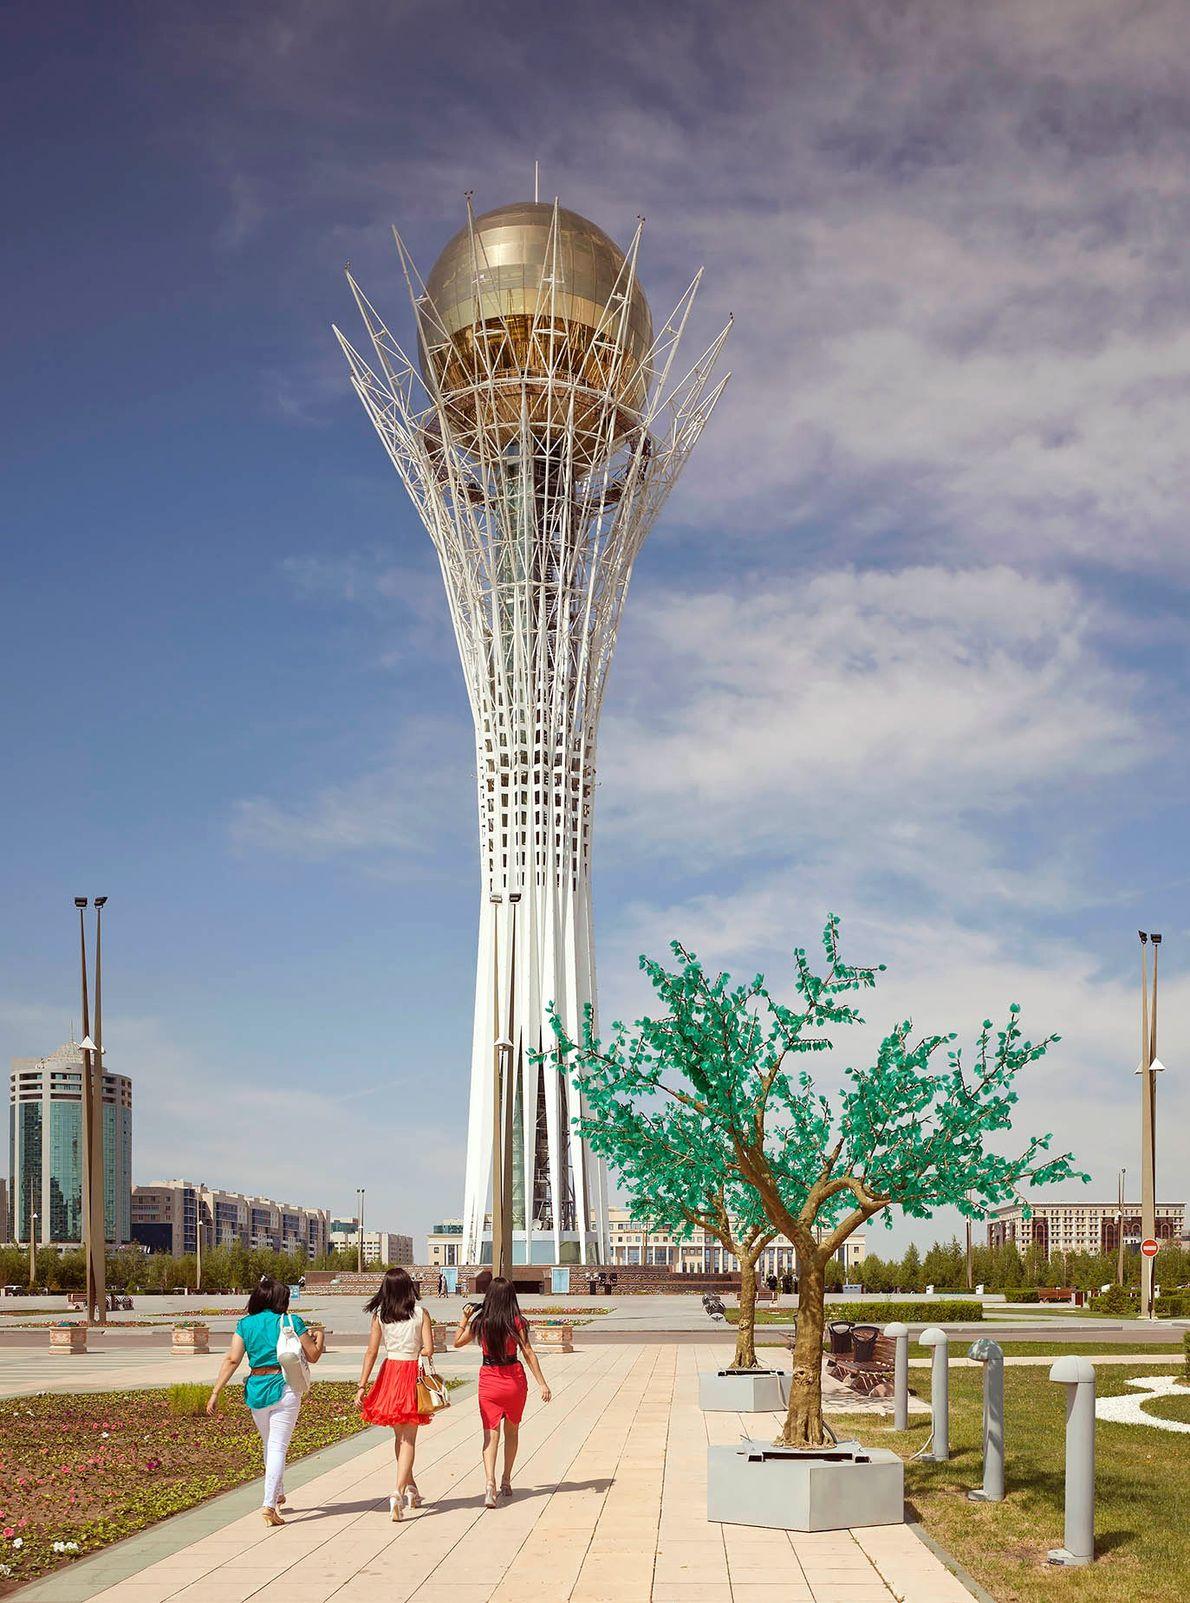 ASTANA, KAZAKHSTAN Bajterek Tower (2002)